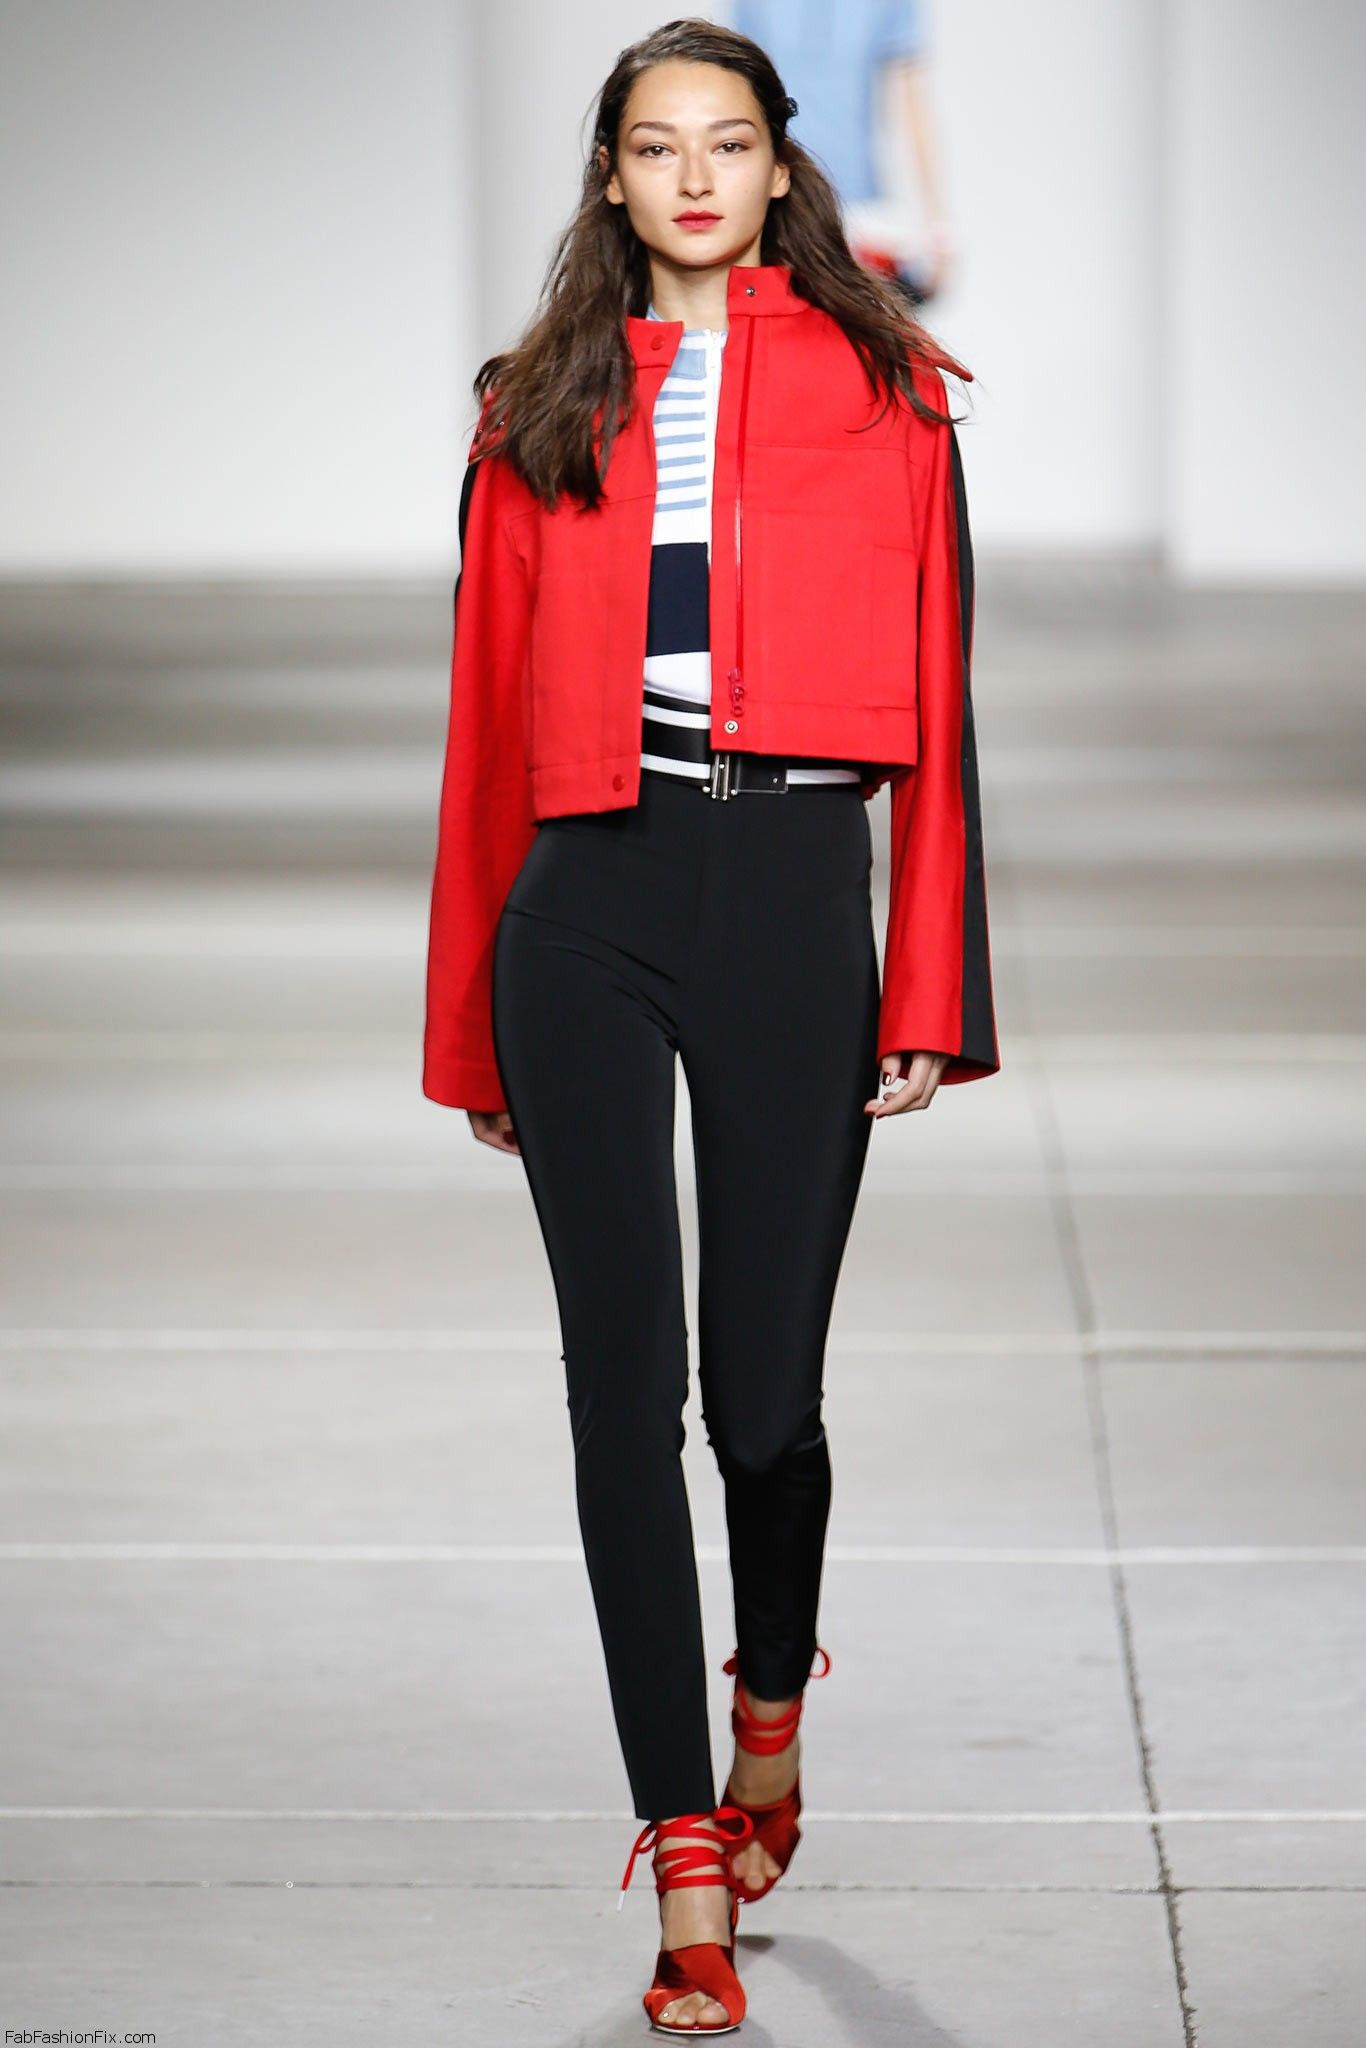 Bruna Tenorio for Topshop Unique spring/summer 2015 collection - London fashion week